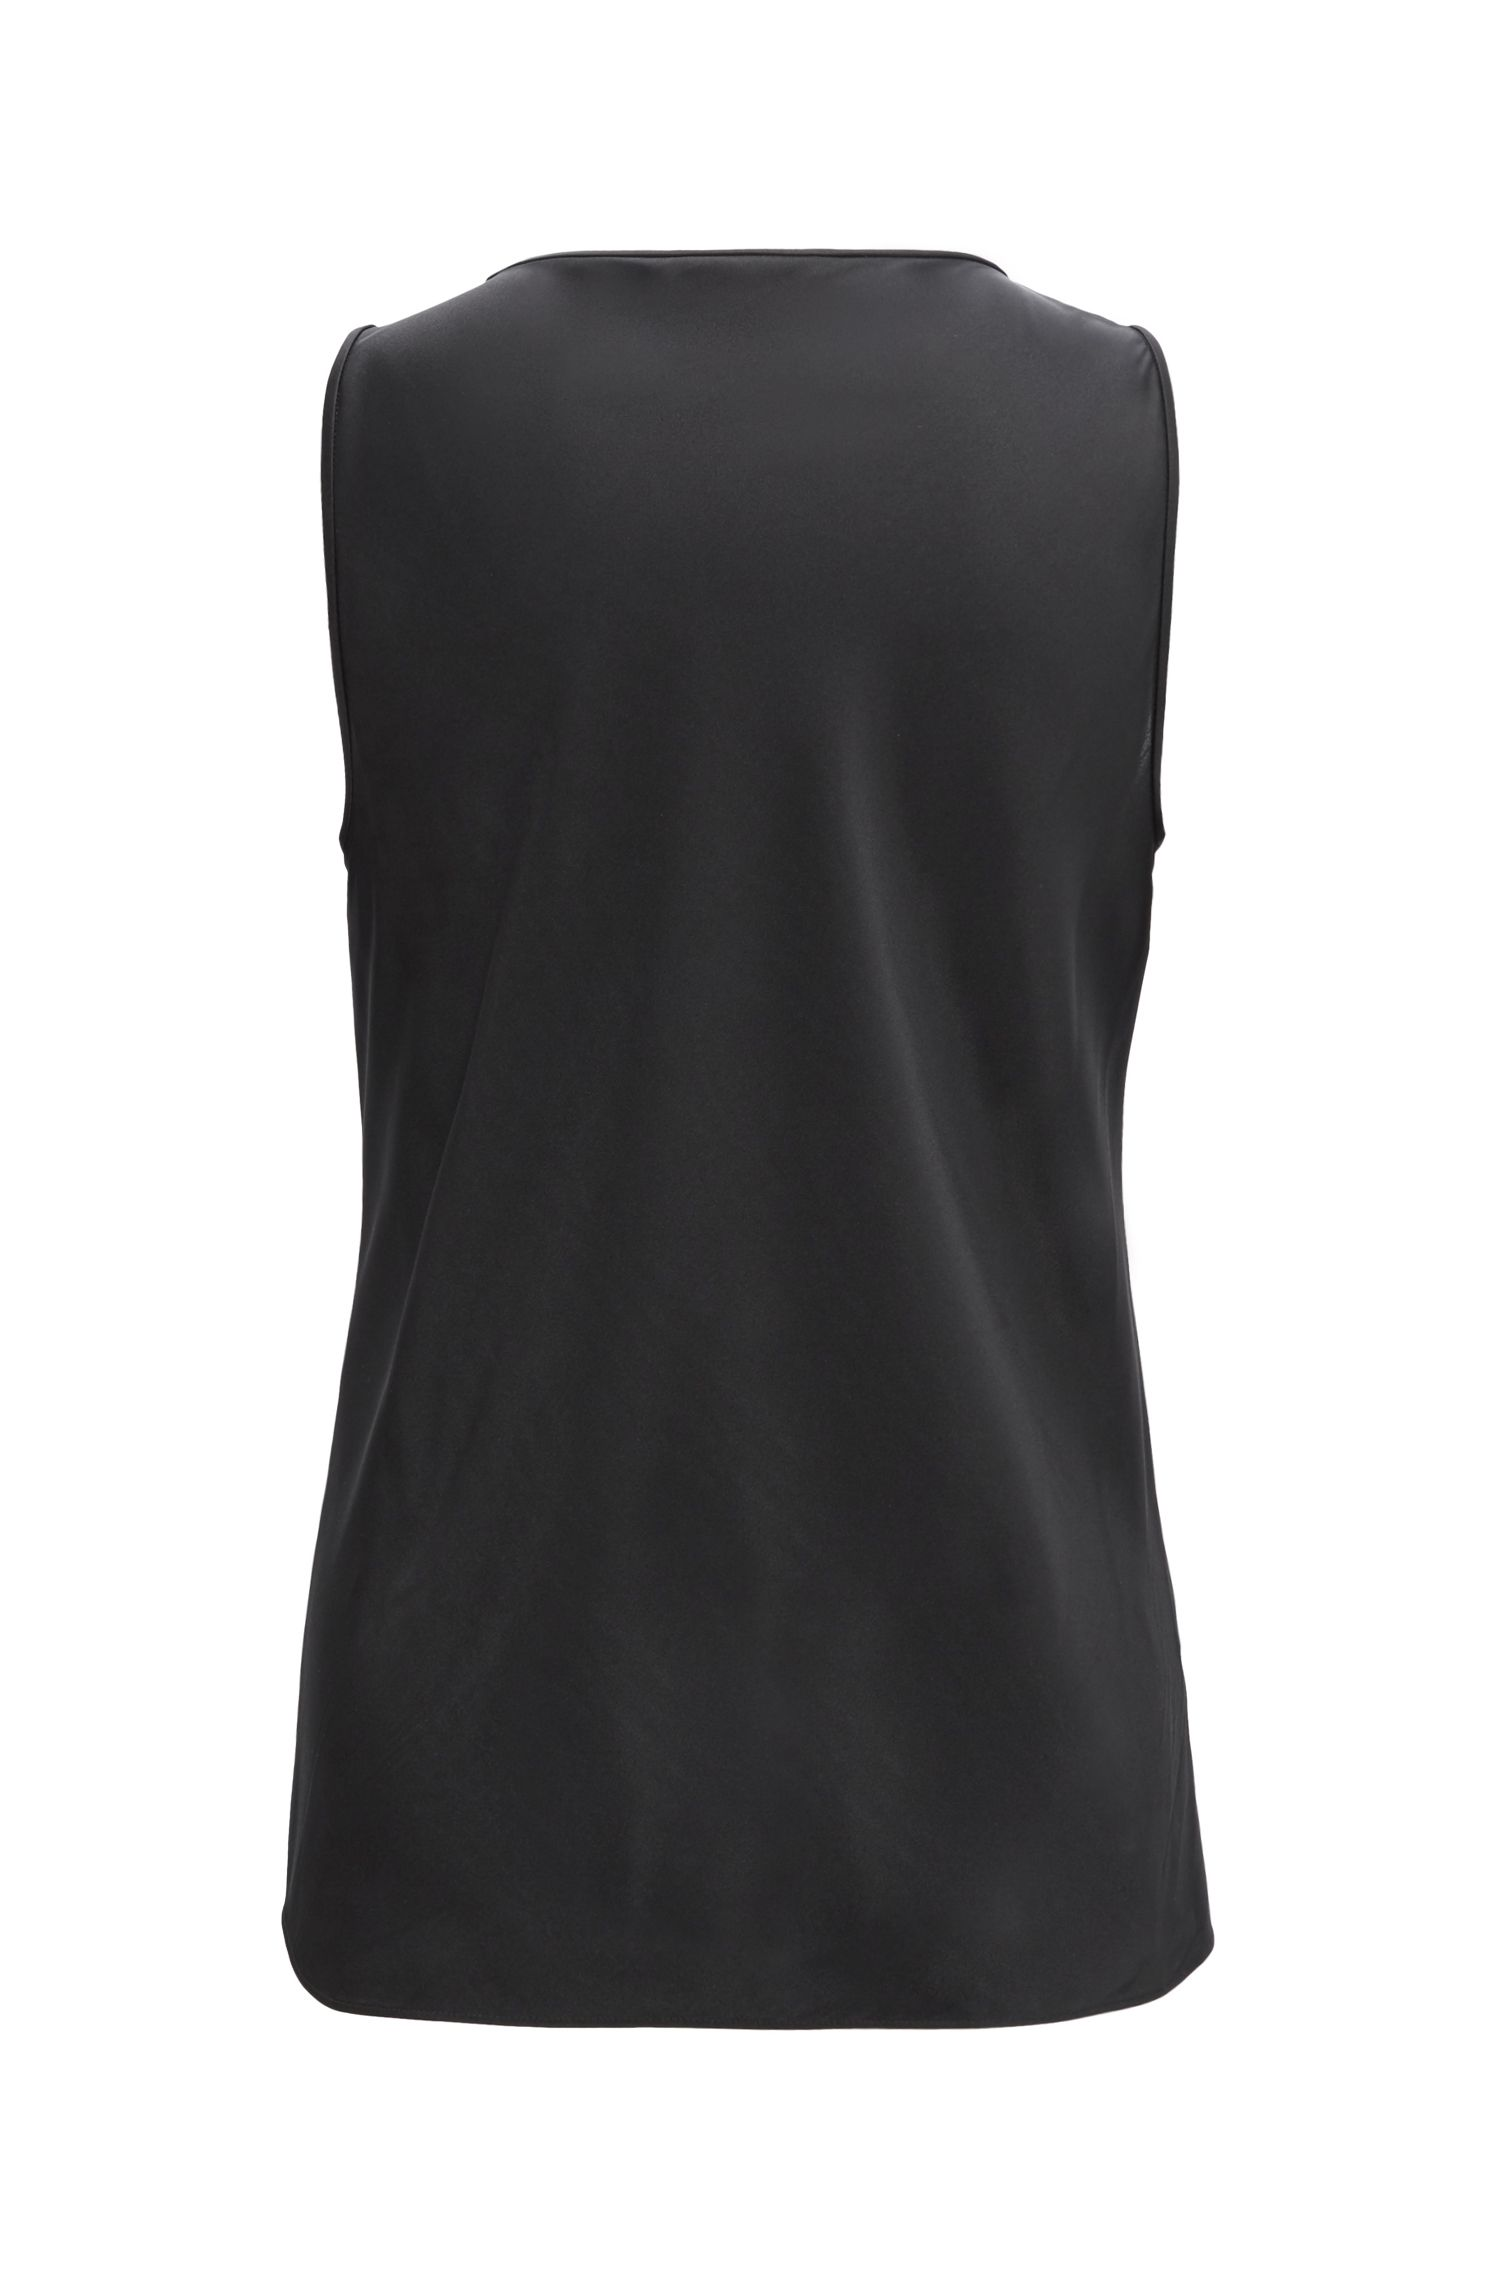 Scoop-neck sleeveless top in stretch silk, Black